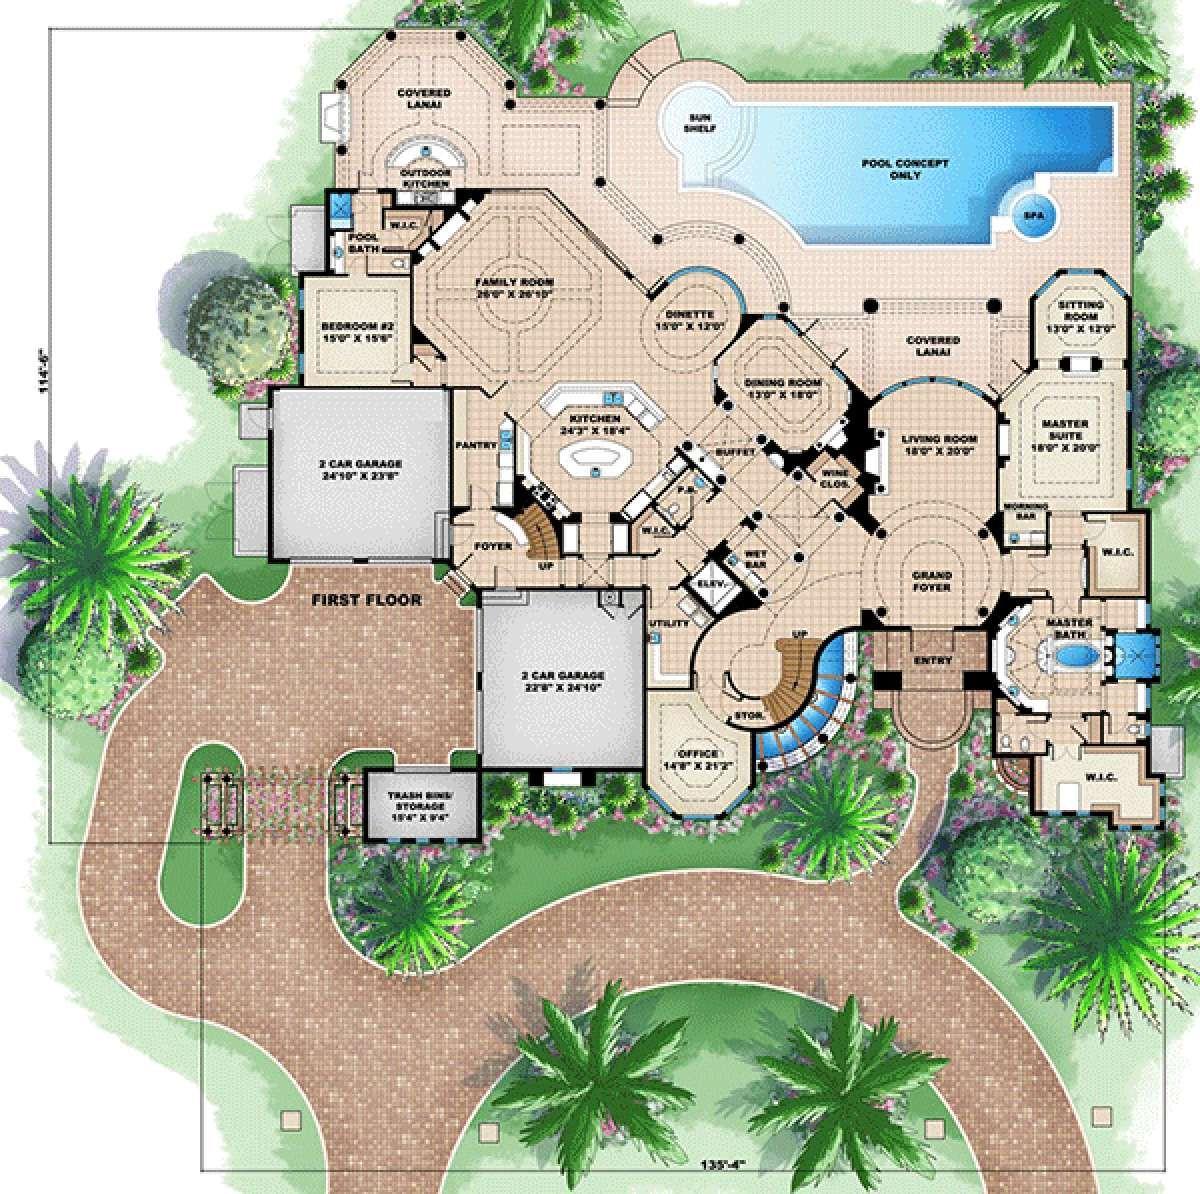 House Plan 1018 00197 Florida Plan 9 202 Square Feet 5 6 Bedrooms 6 Bathrooms Beach House Flooring Mediterranean Style House Plans Home Design Floor Plans